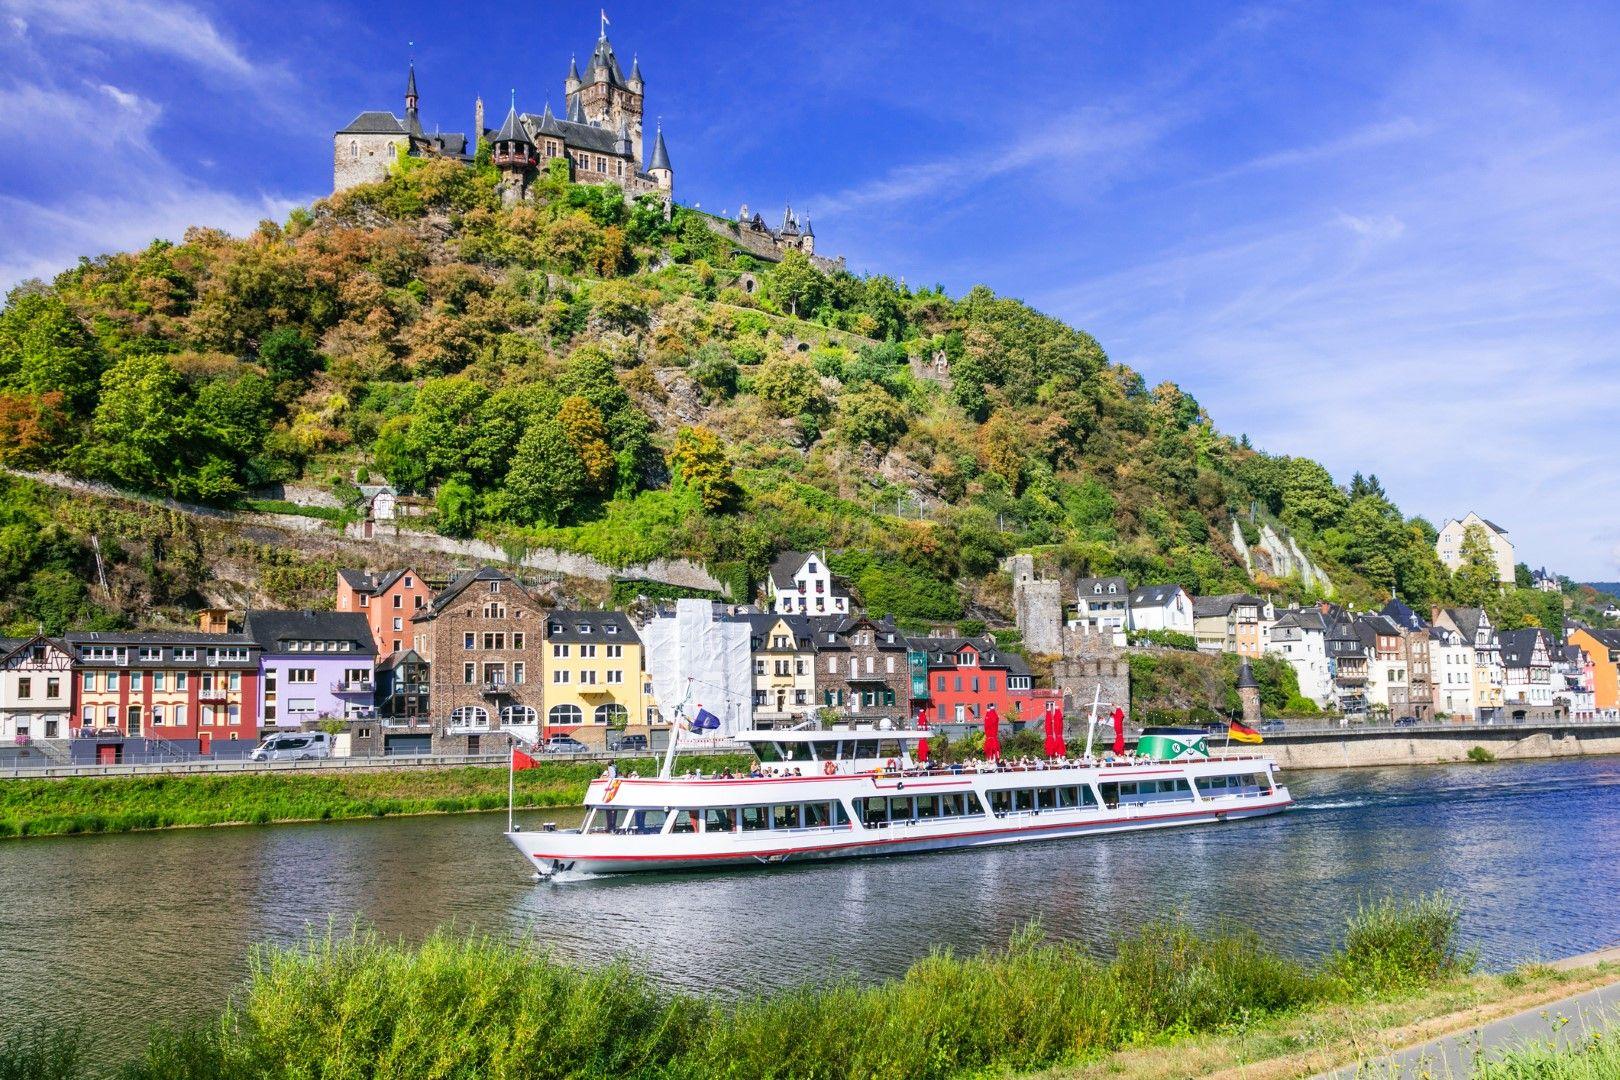 Круиз по река Рейн, Германия